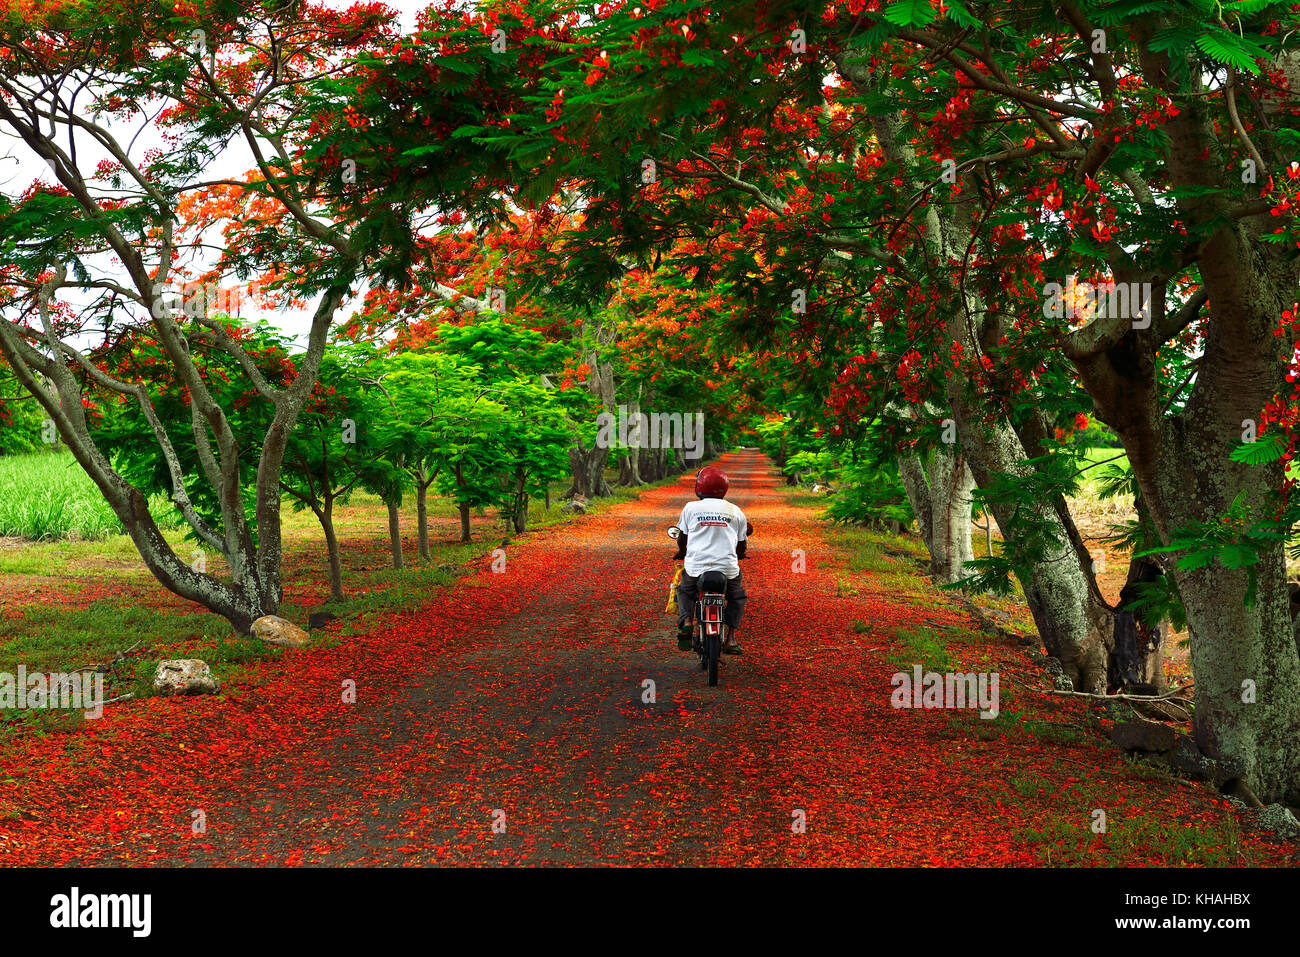 Moped rider on avenue with Royal Poincianasn, Flamboyant (Delonix regia), Mauritius - Stock Image